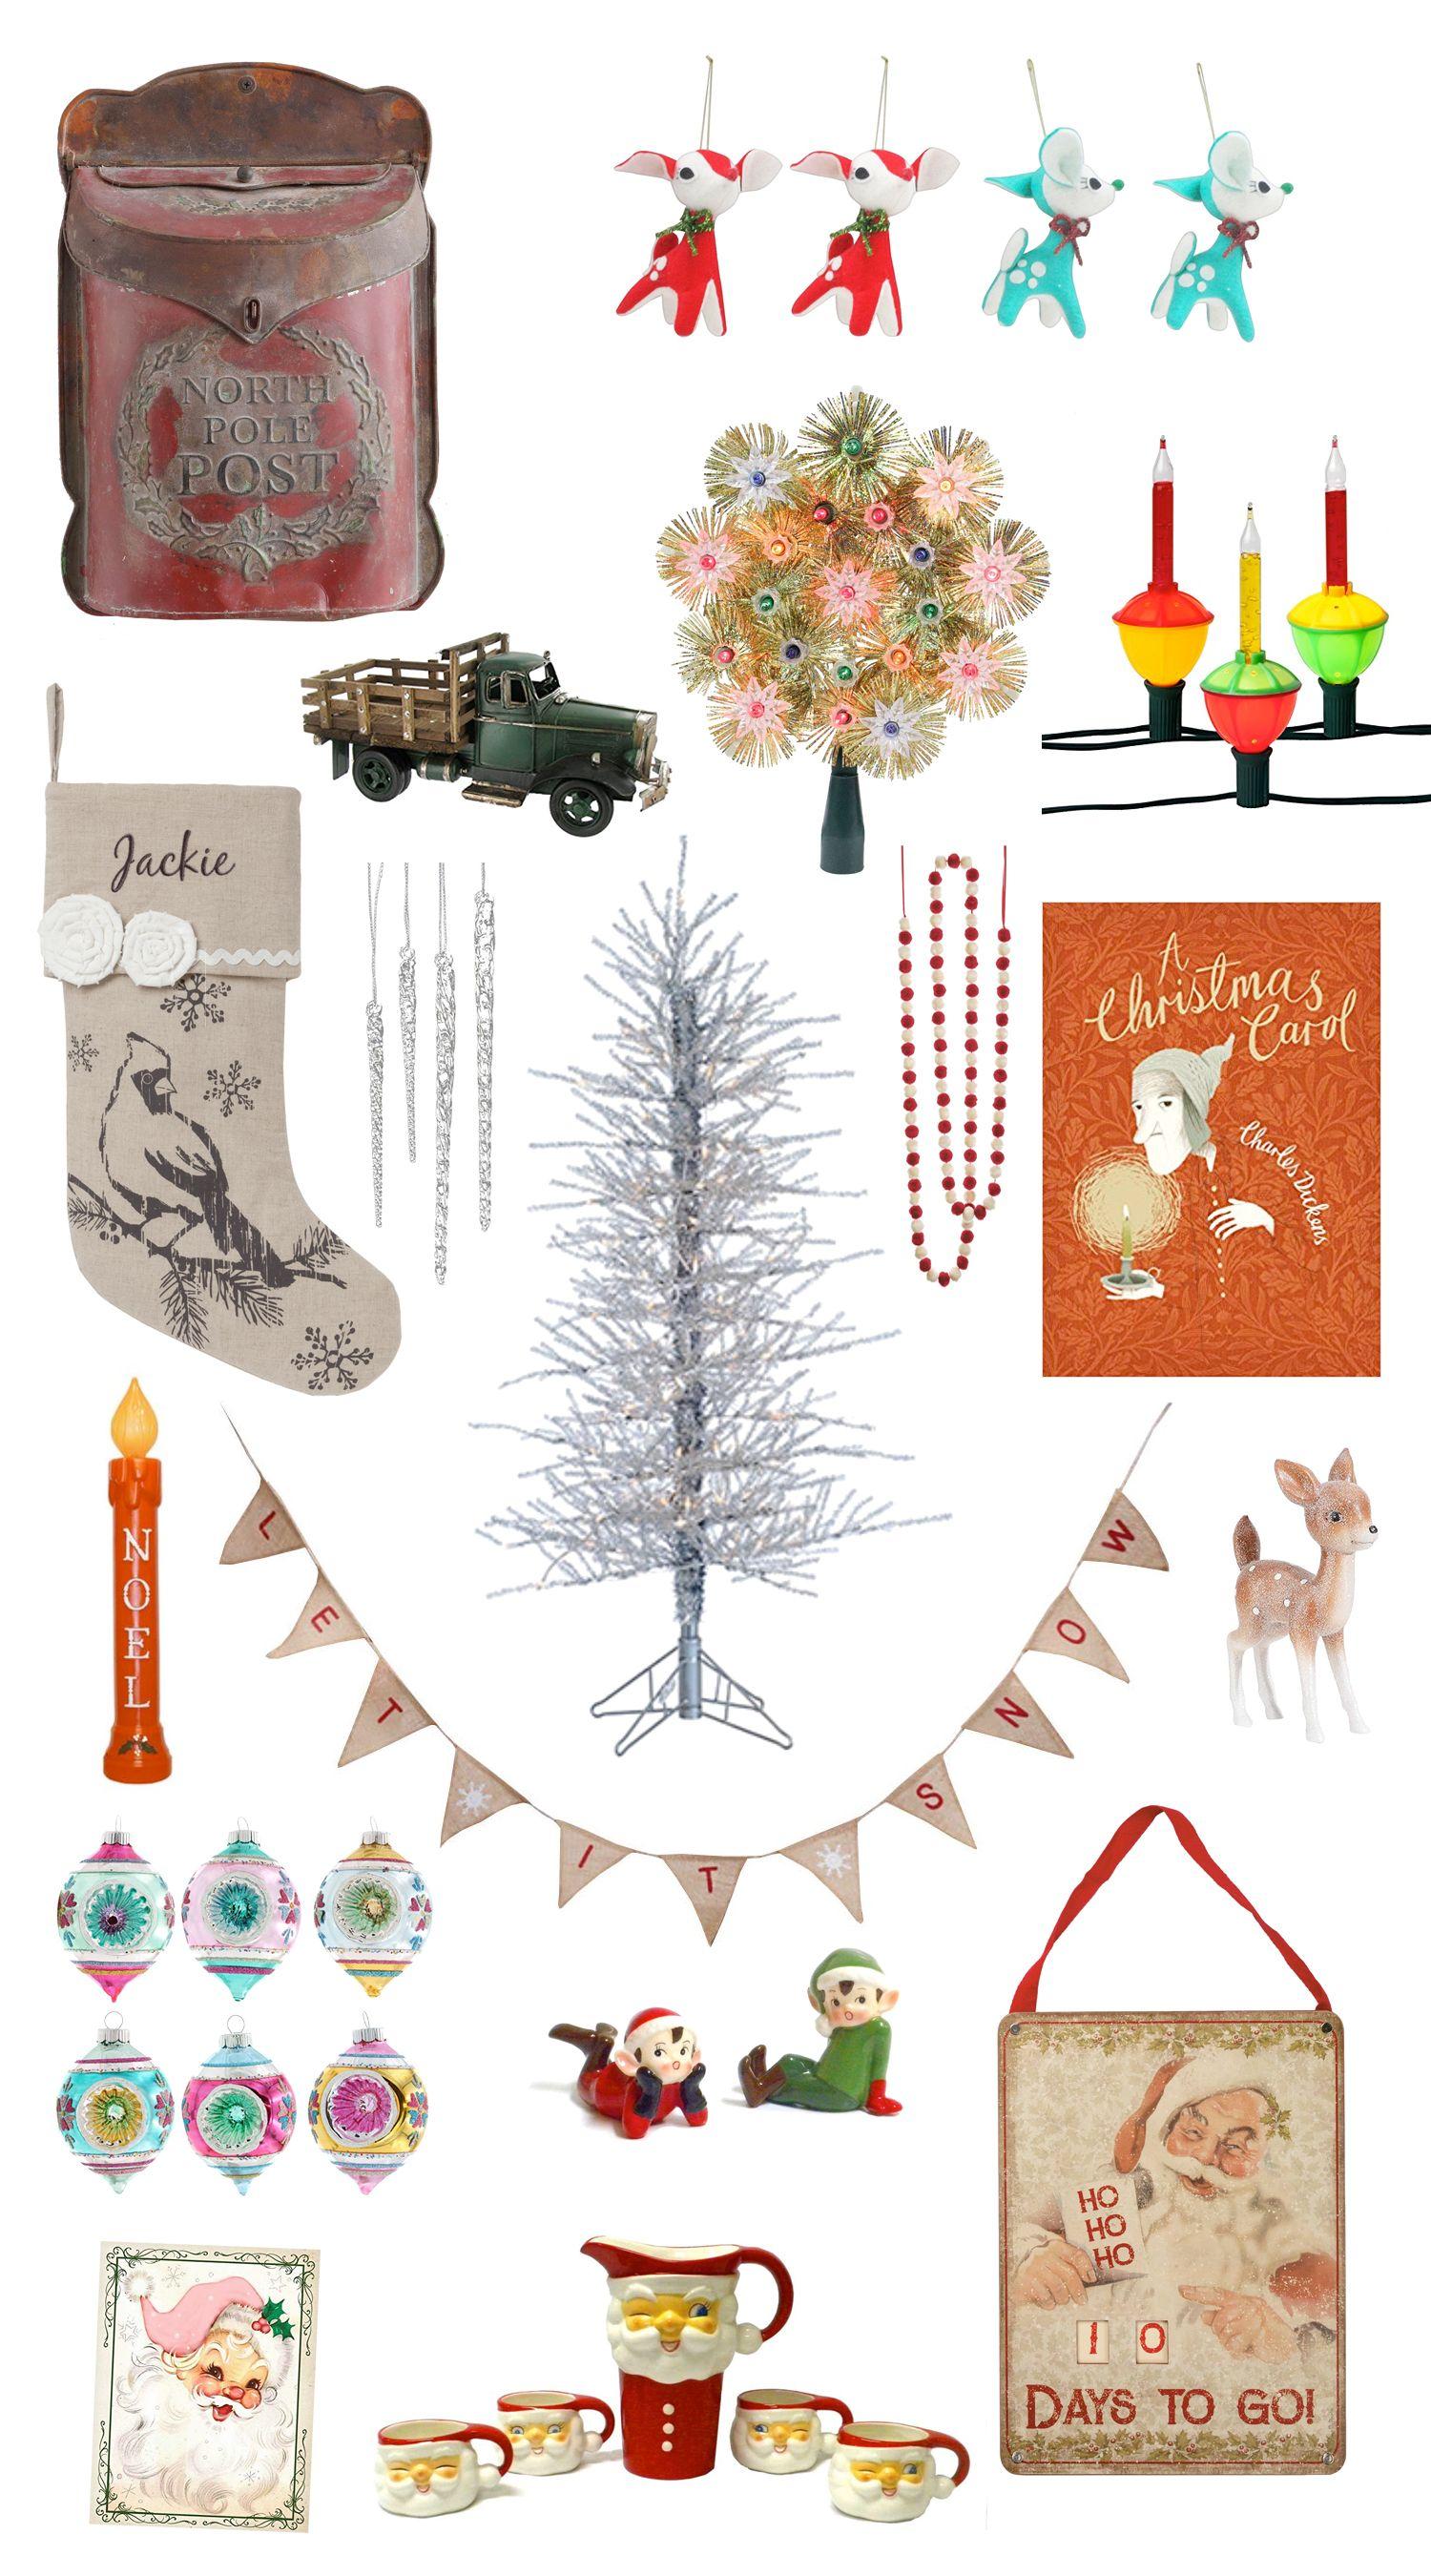 Vintage Christmas Decorations Vintage Christmas Decorations Vintage Style Christmas Decorations Christmas Decorations